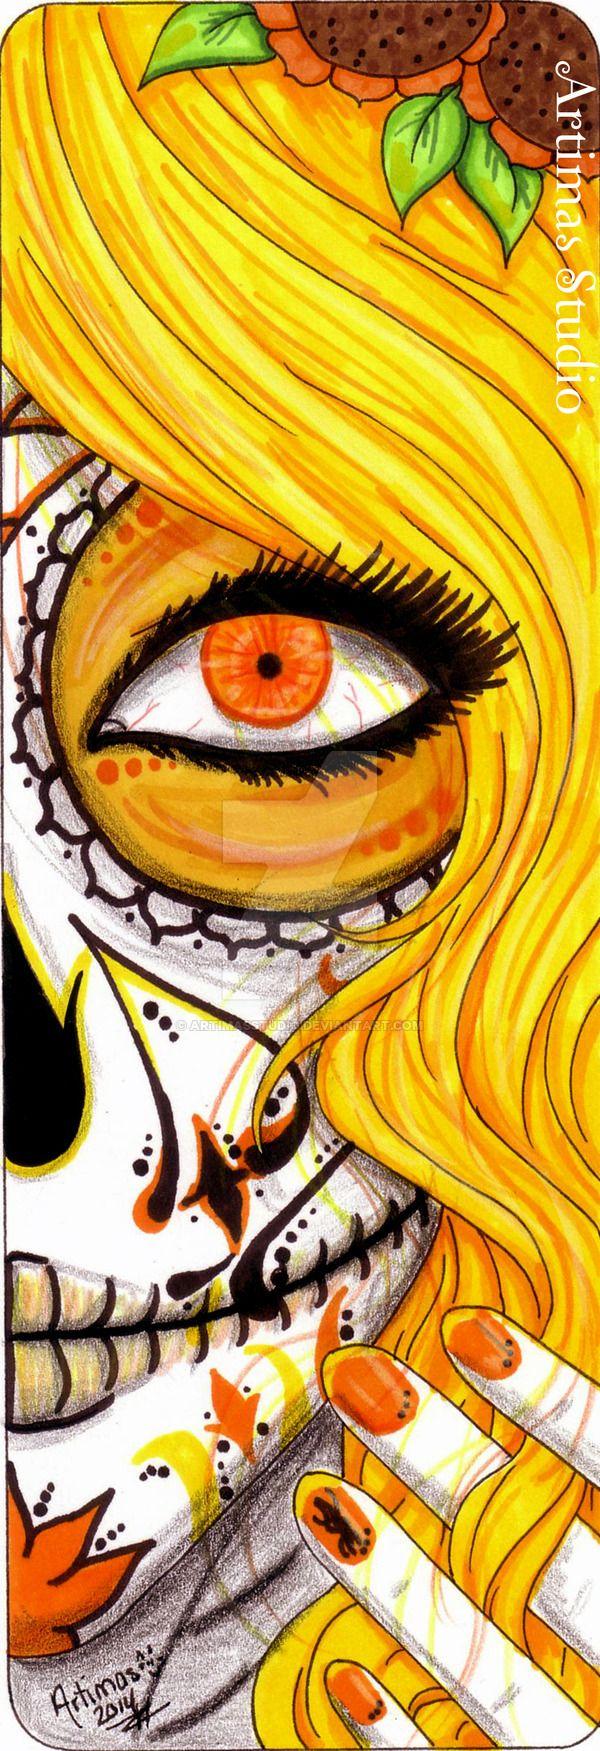 Yellow Death 1.5 by ArtimasStudio.deviantart.com on @DeviantArt